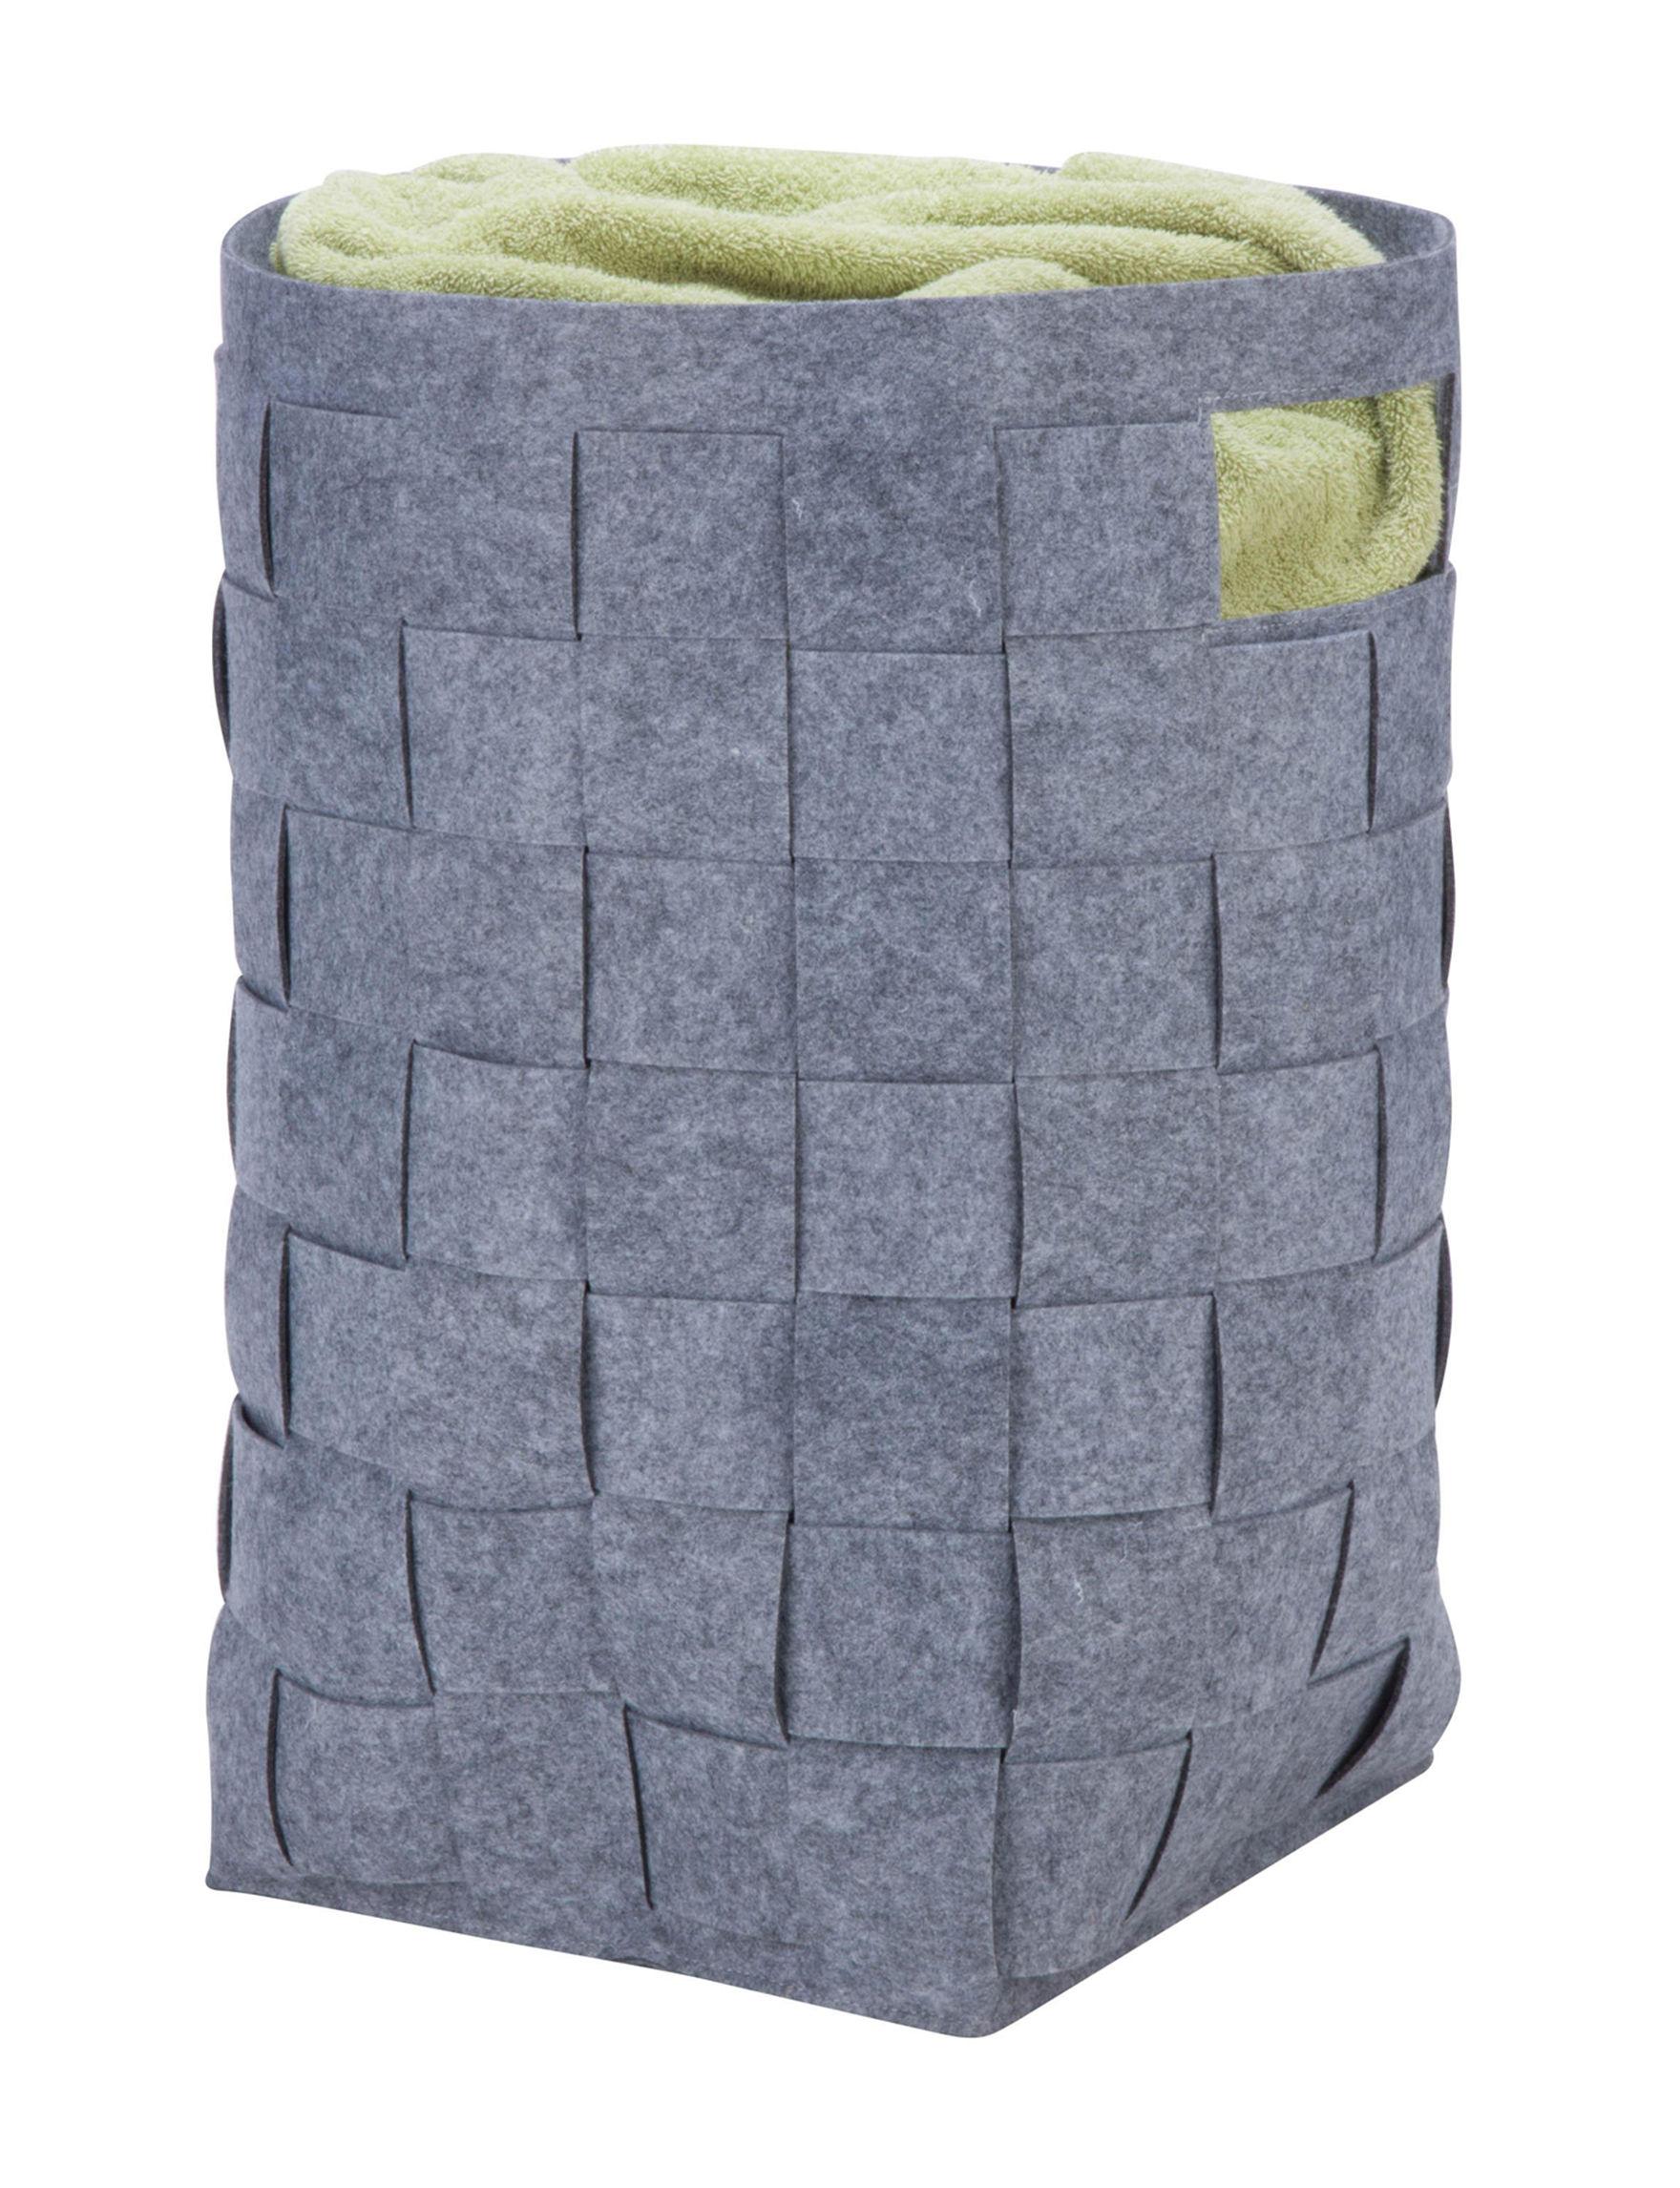 Honey-Can-Do International Dark Grey Laundry Hampers Irons & Clothing Care